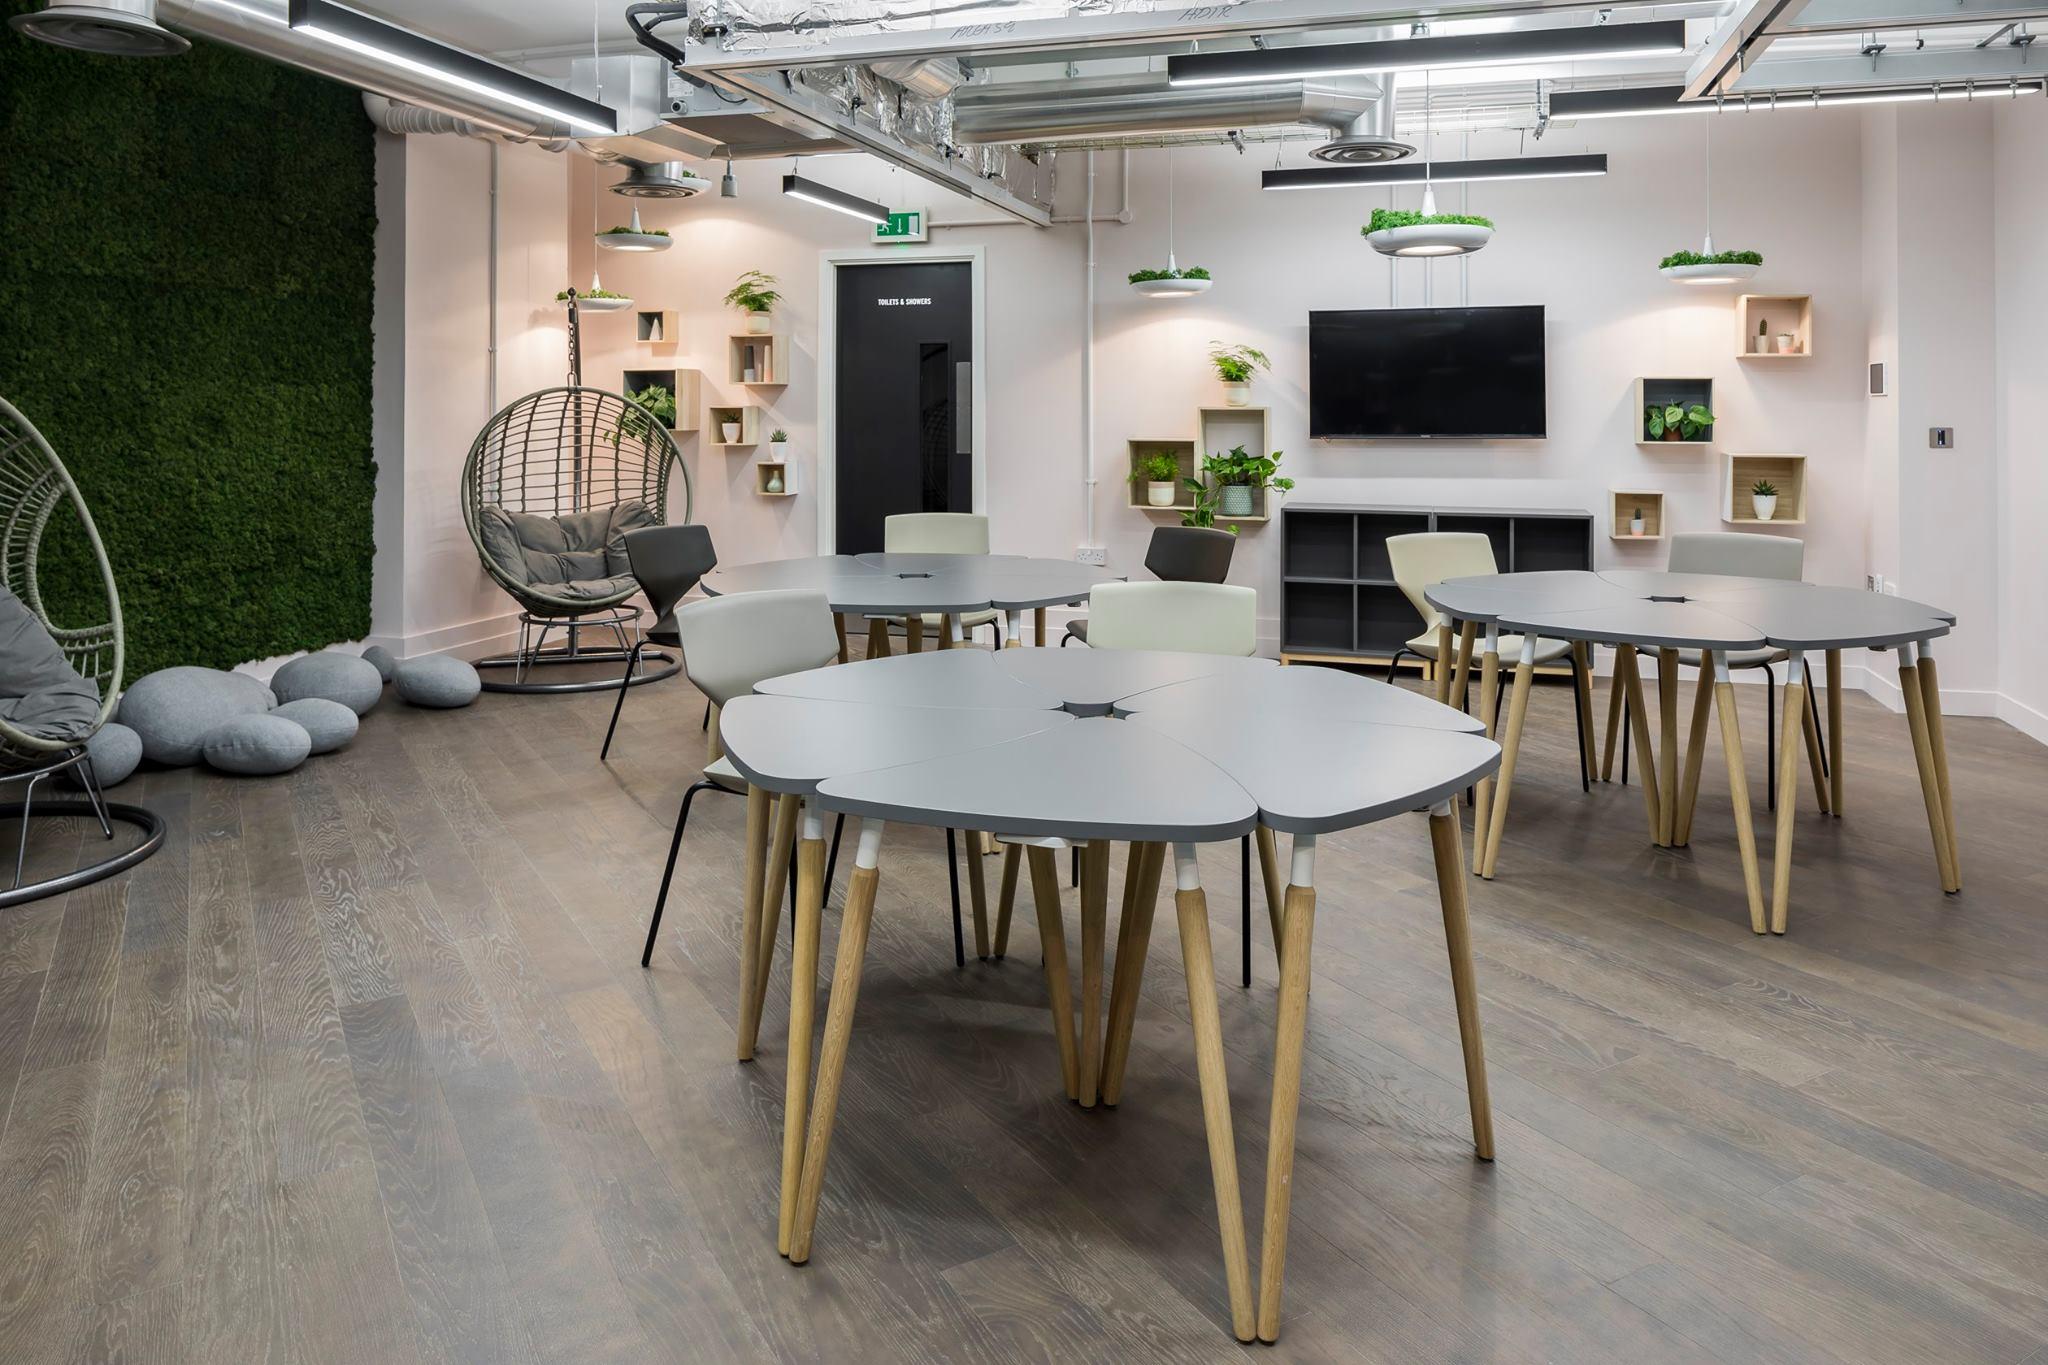 Table de réunion modulable design